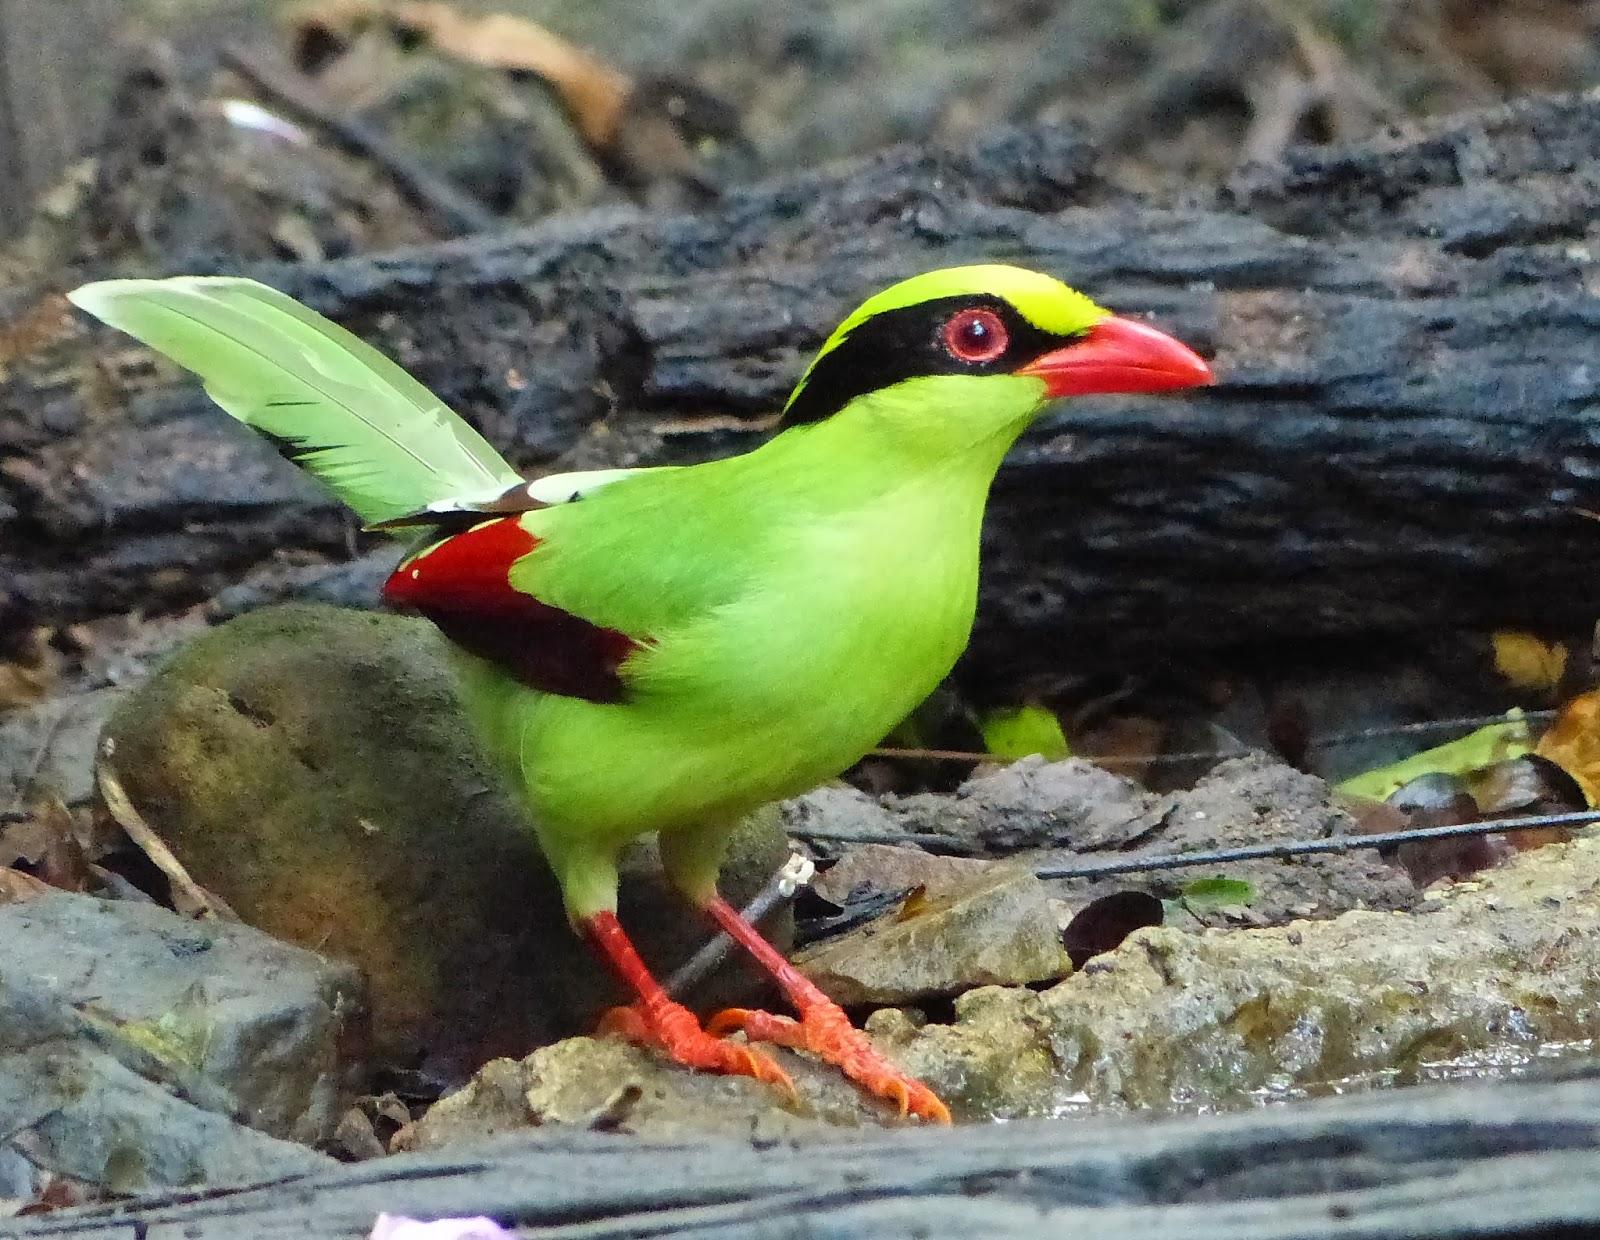 Birder always on the lookout for fine birds thailand photos